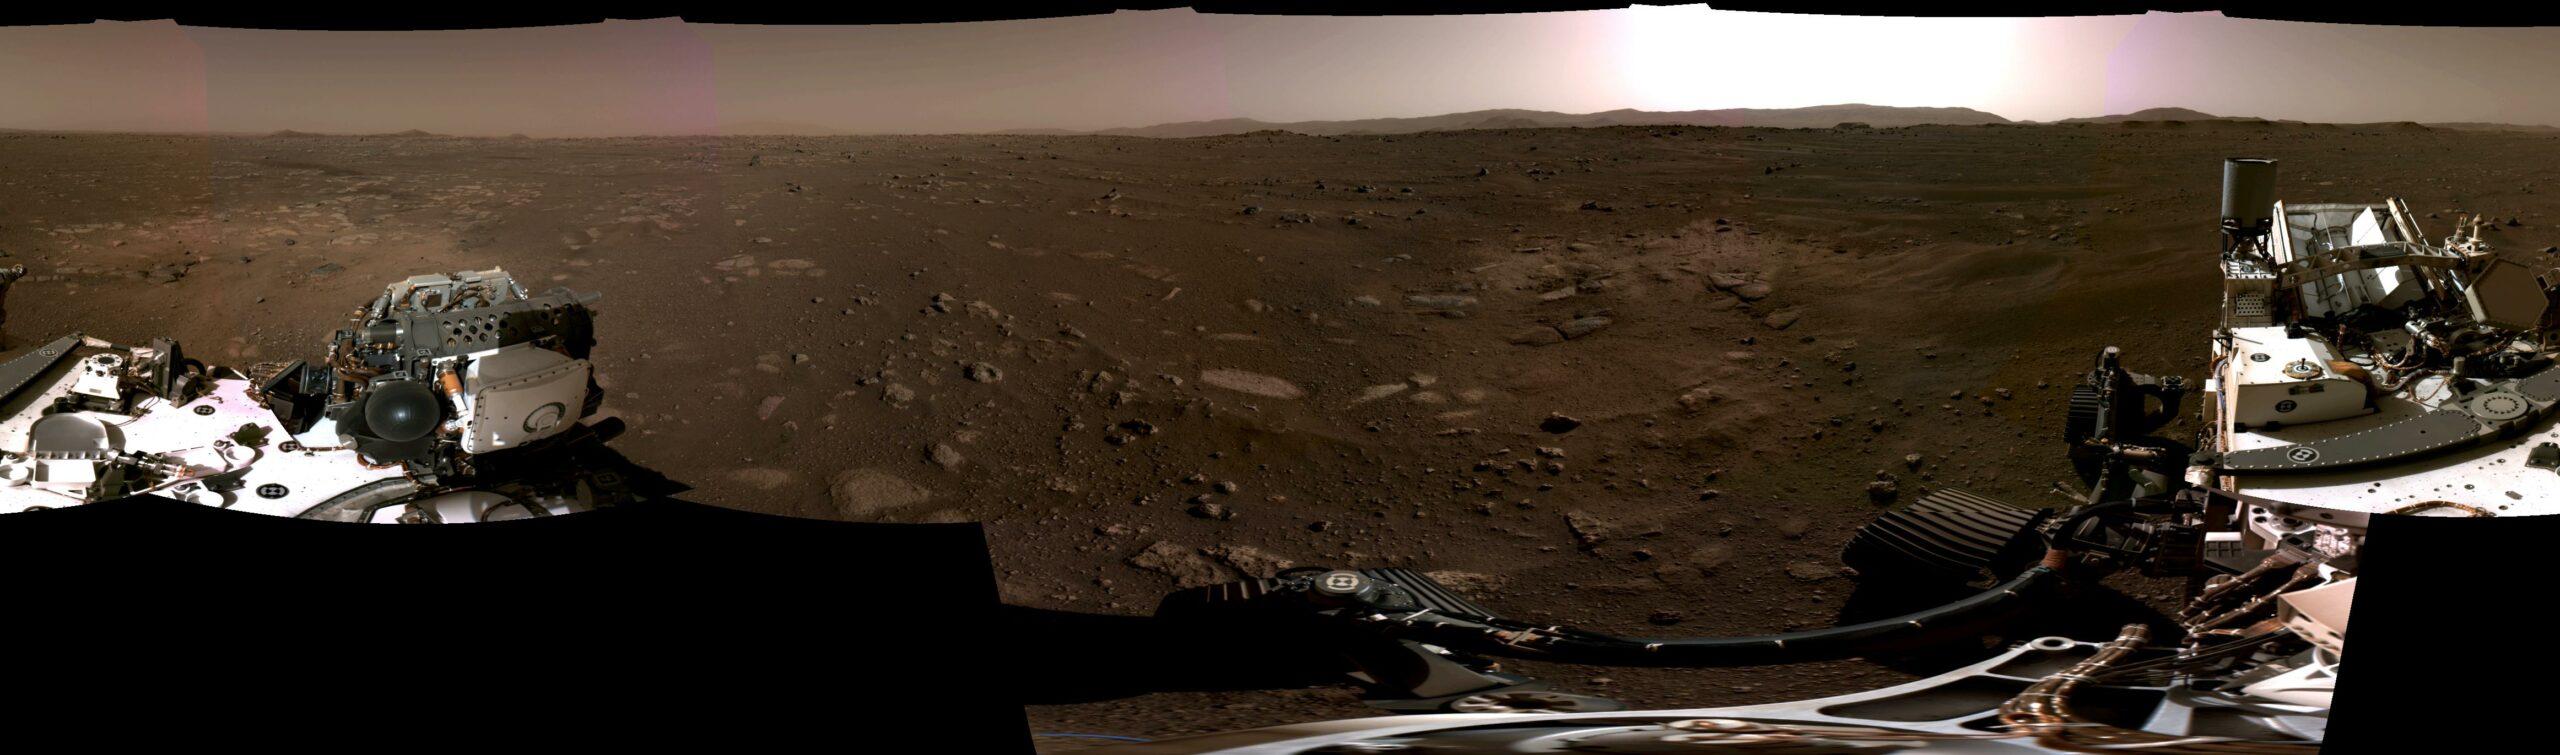 Le panorama. Image NASA / JPL-CALTECH